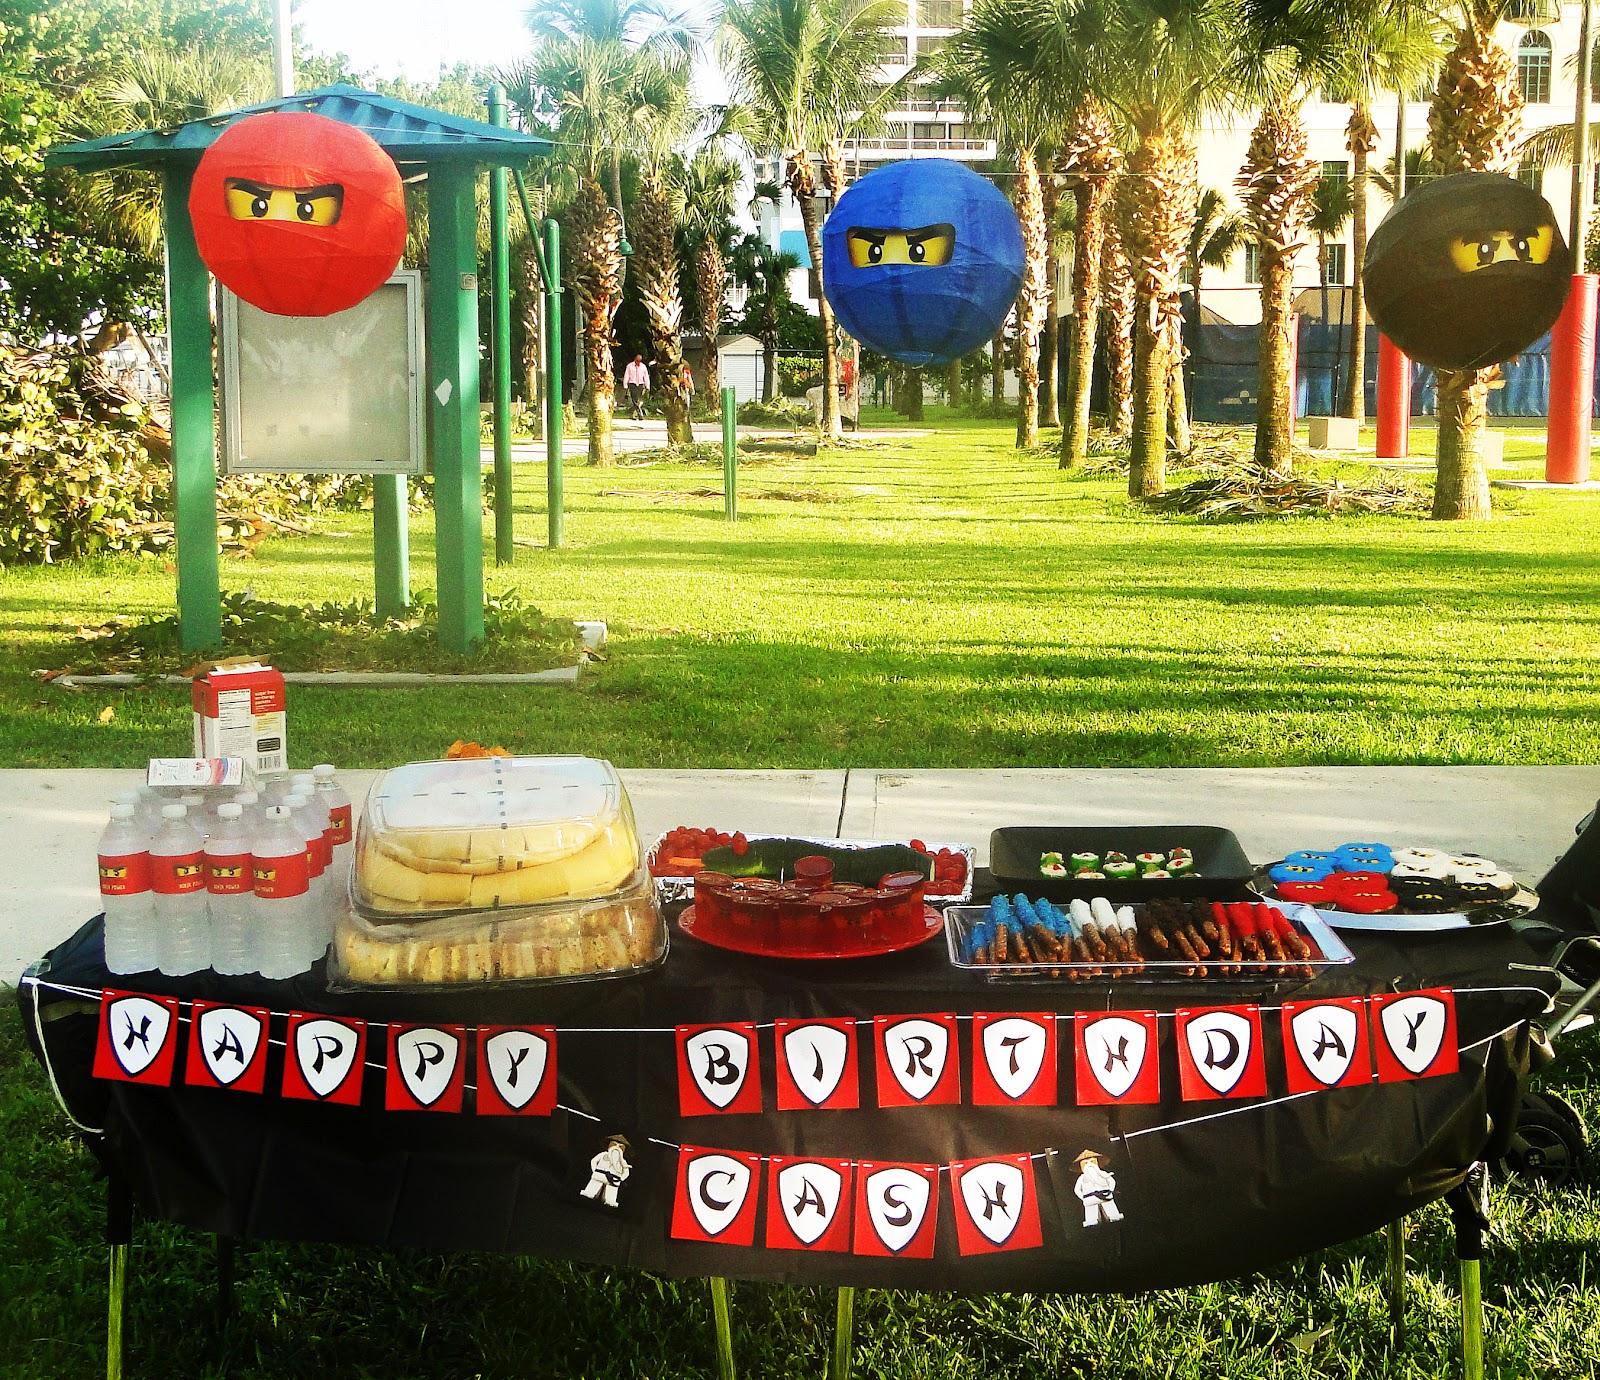 Lego Ninjago Birthday Party Google Search: The Isoms: Ninjago Birthday Party